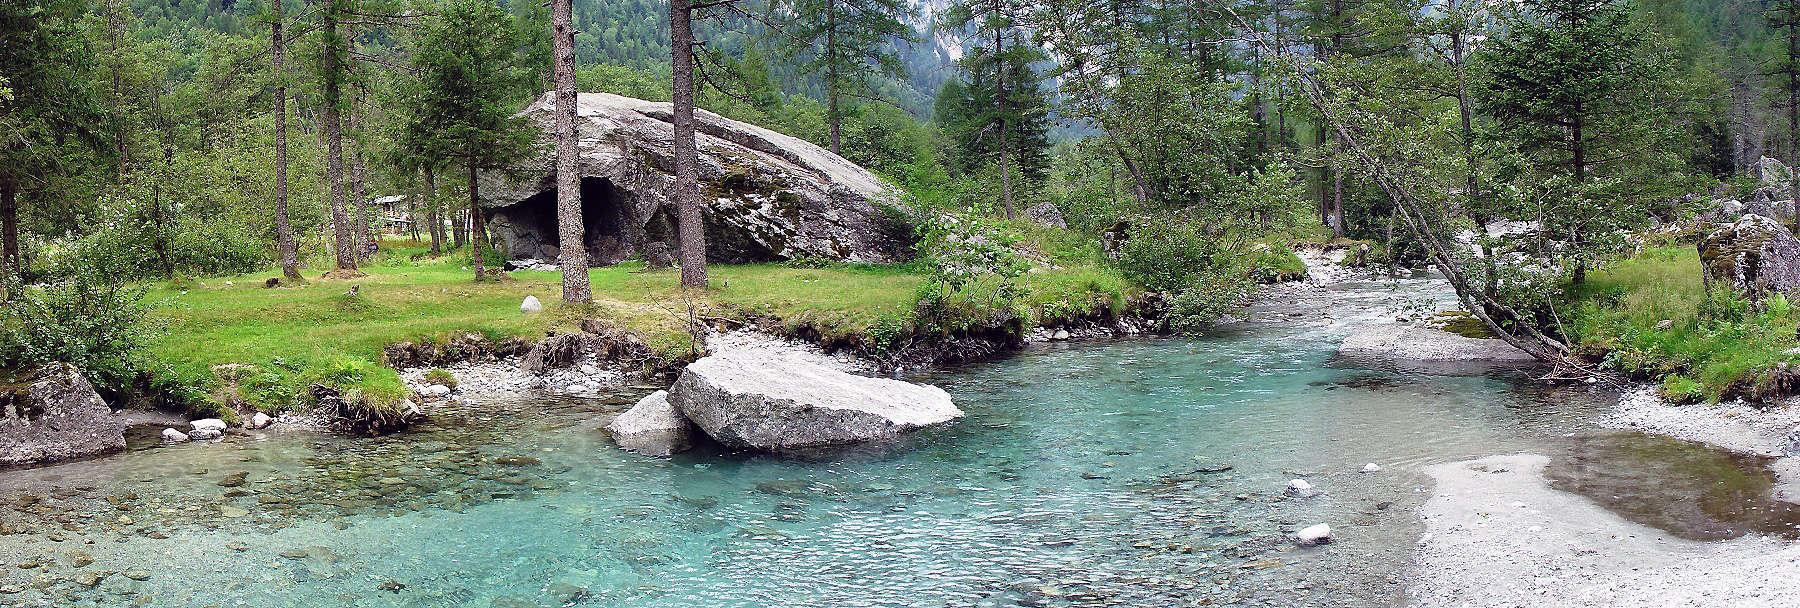 Acquario biotopo